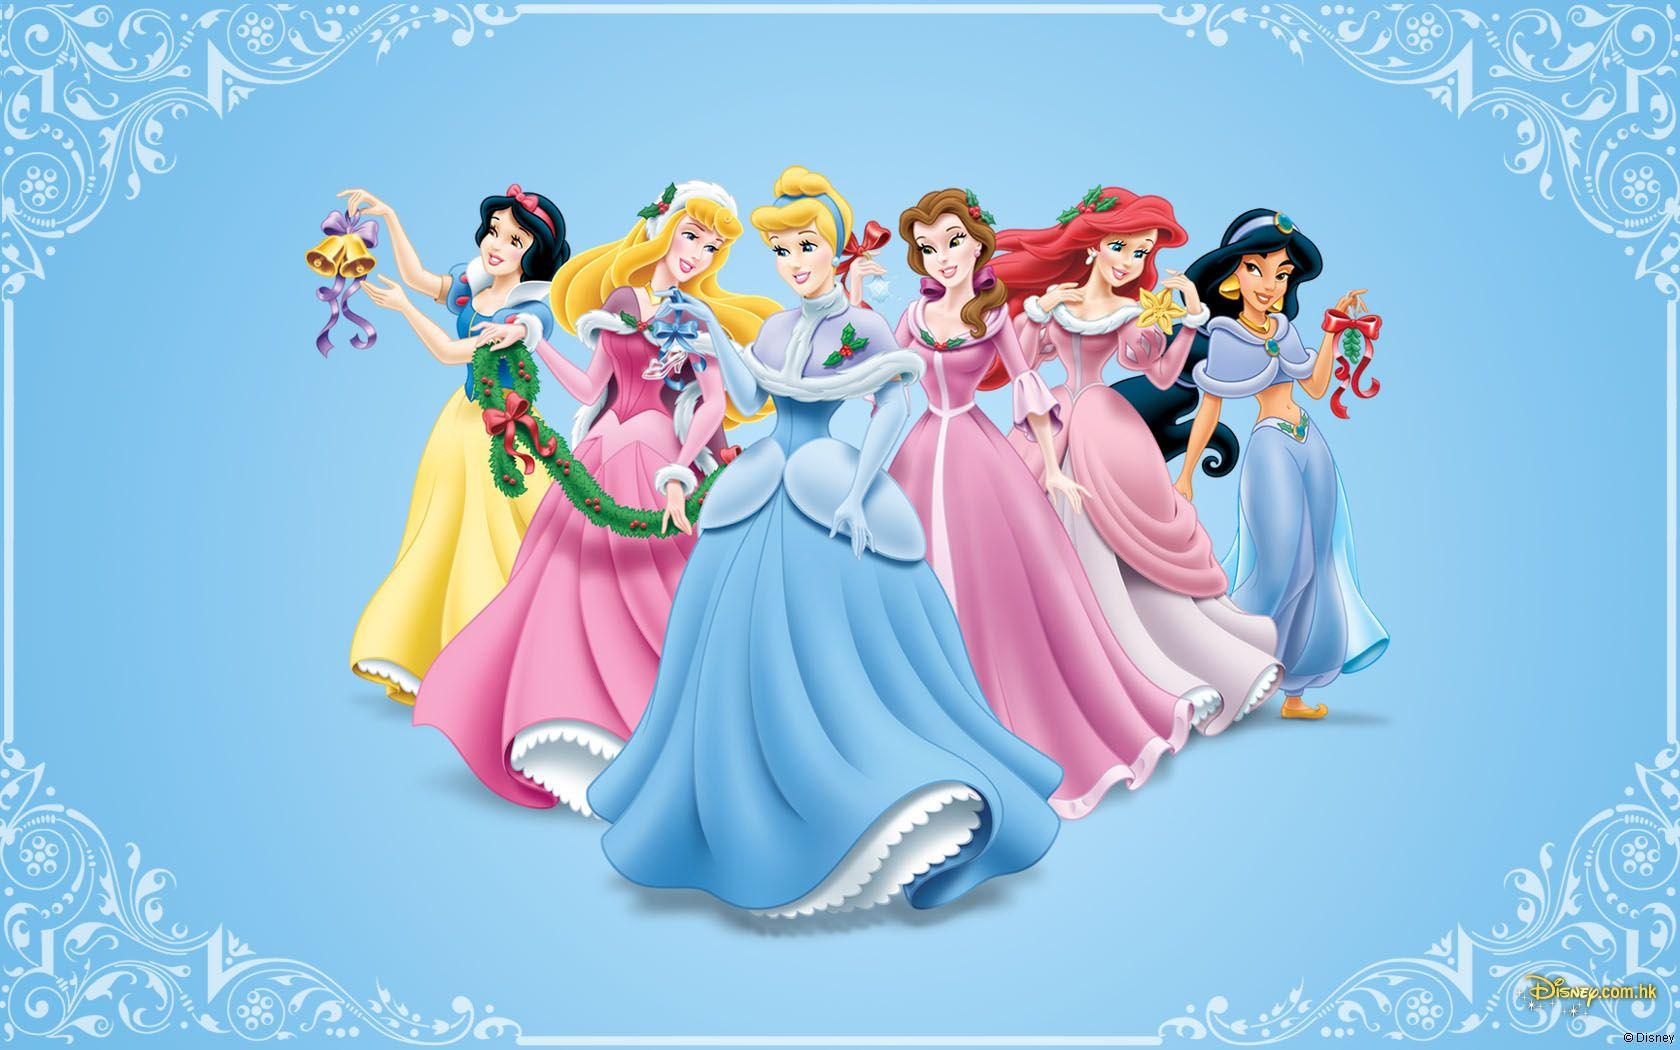 Disney Christmas Wallpaper Disney Princess Christmas Disney Princess Wallpaper Disney Princess Images Princess Cartoon